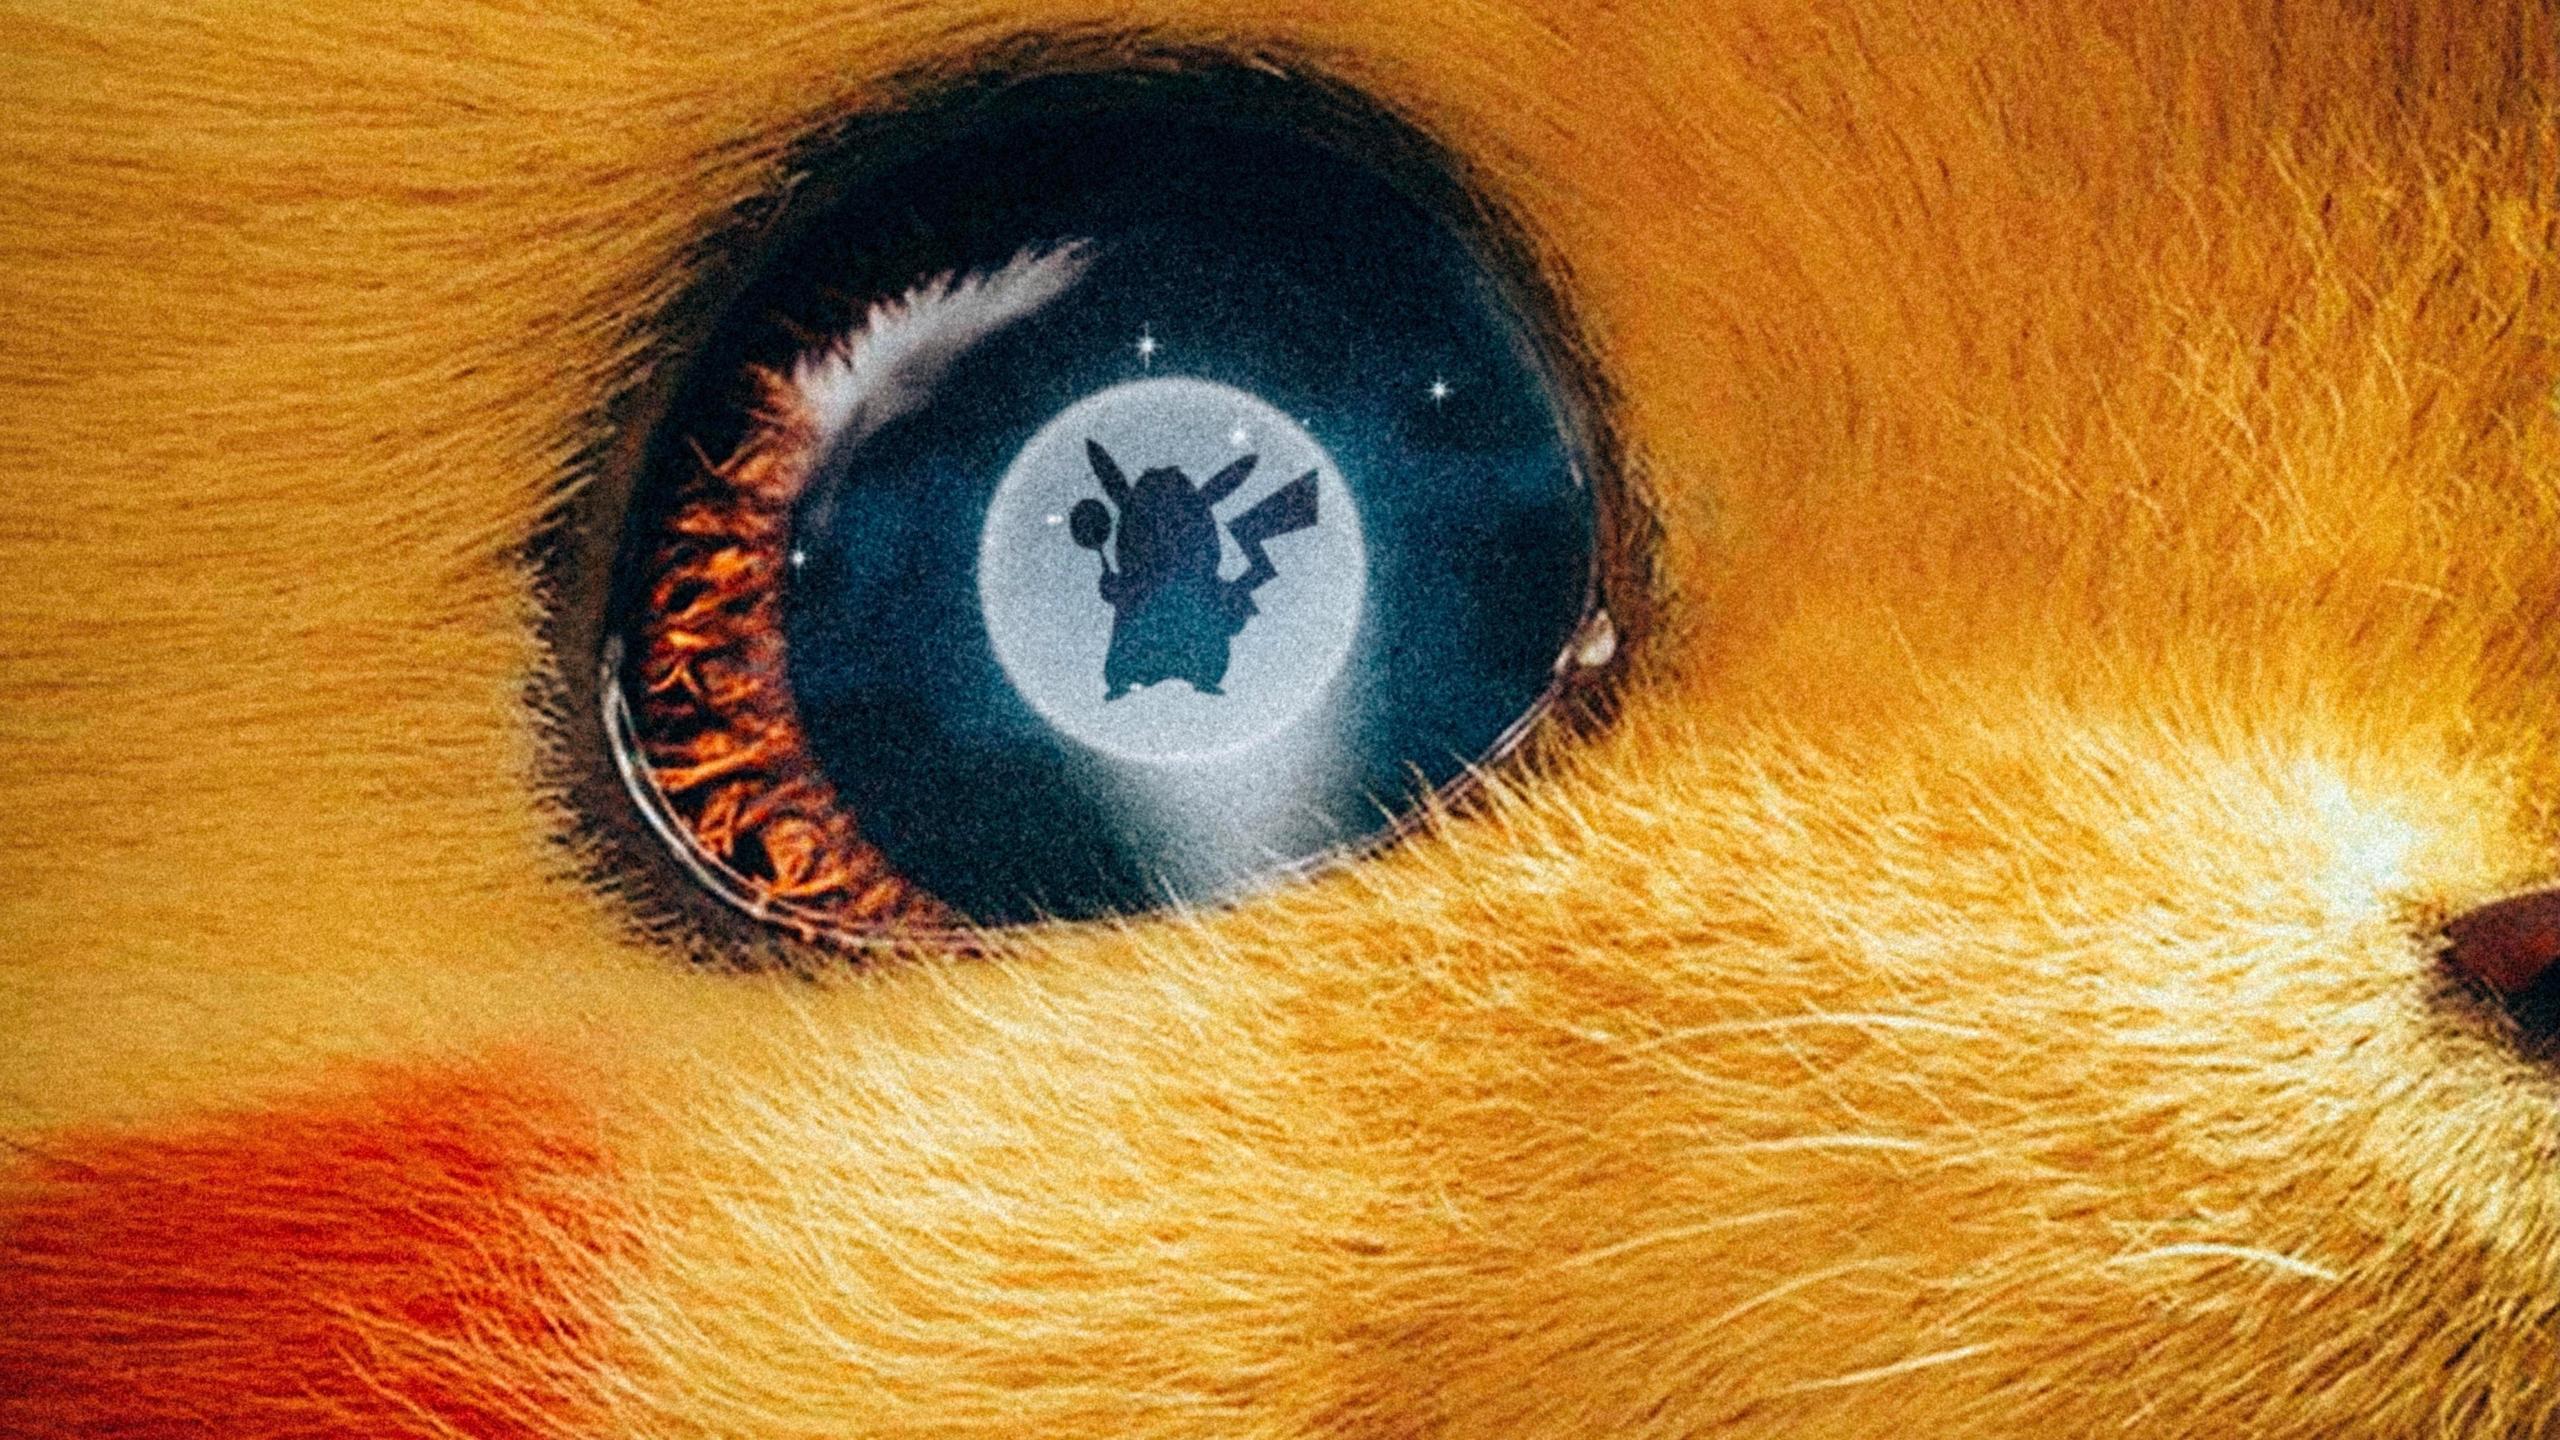 Cool Desktop Wallpaper Ideas – Creates Cute Pikachu Designs on Your Desktop